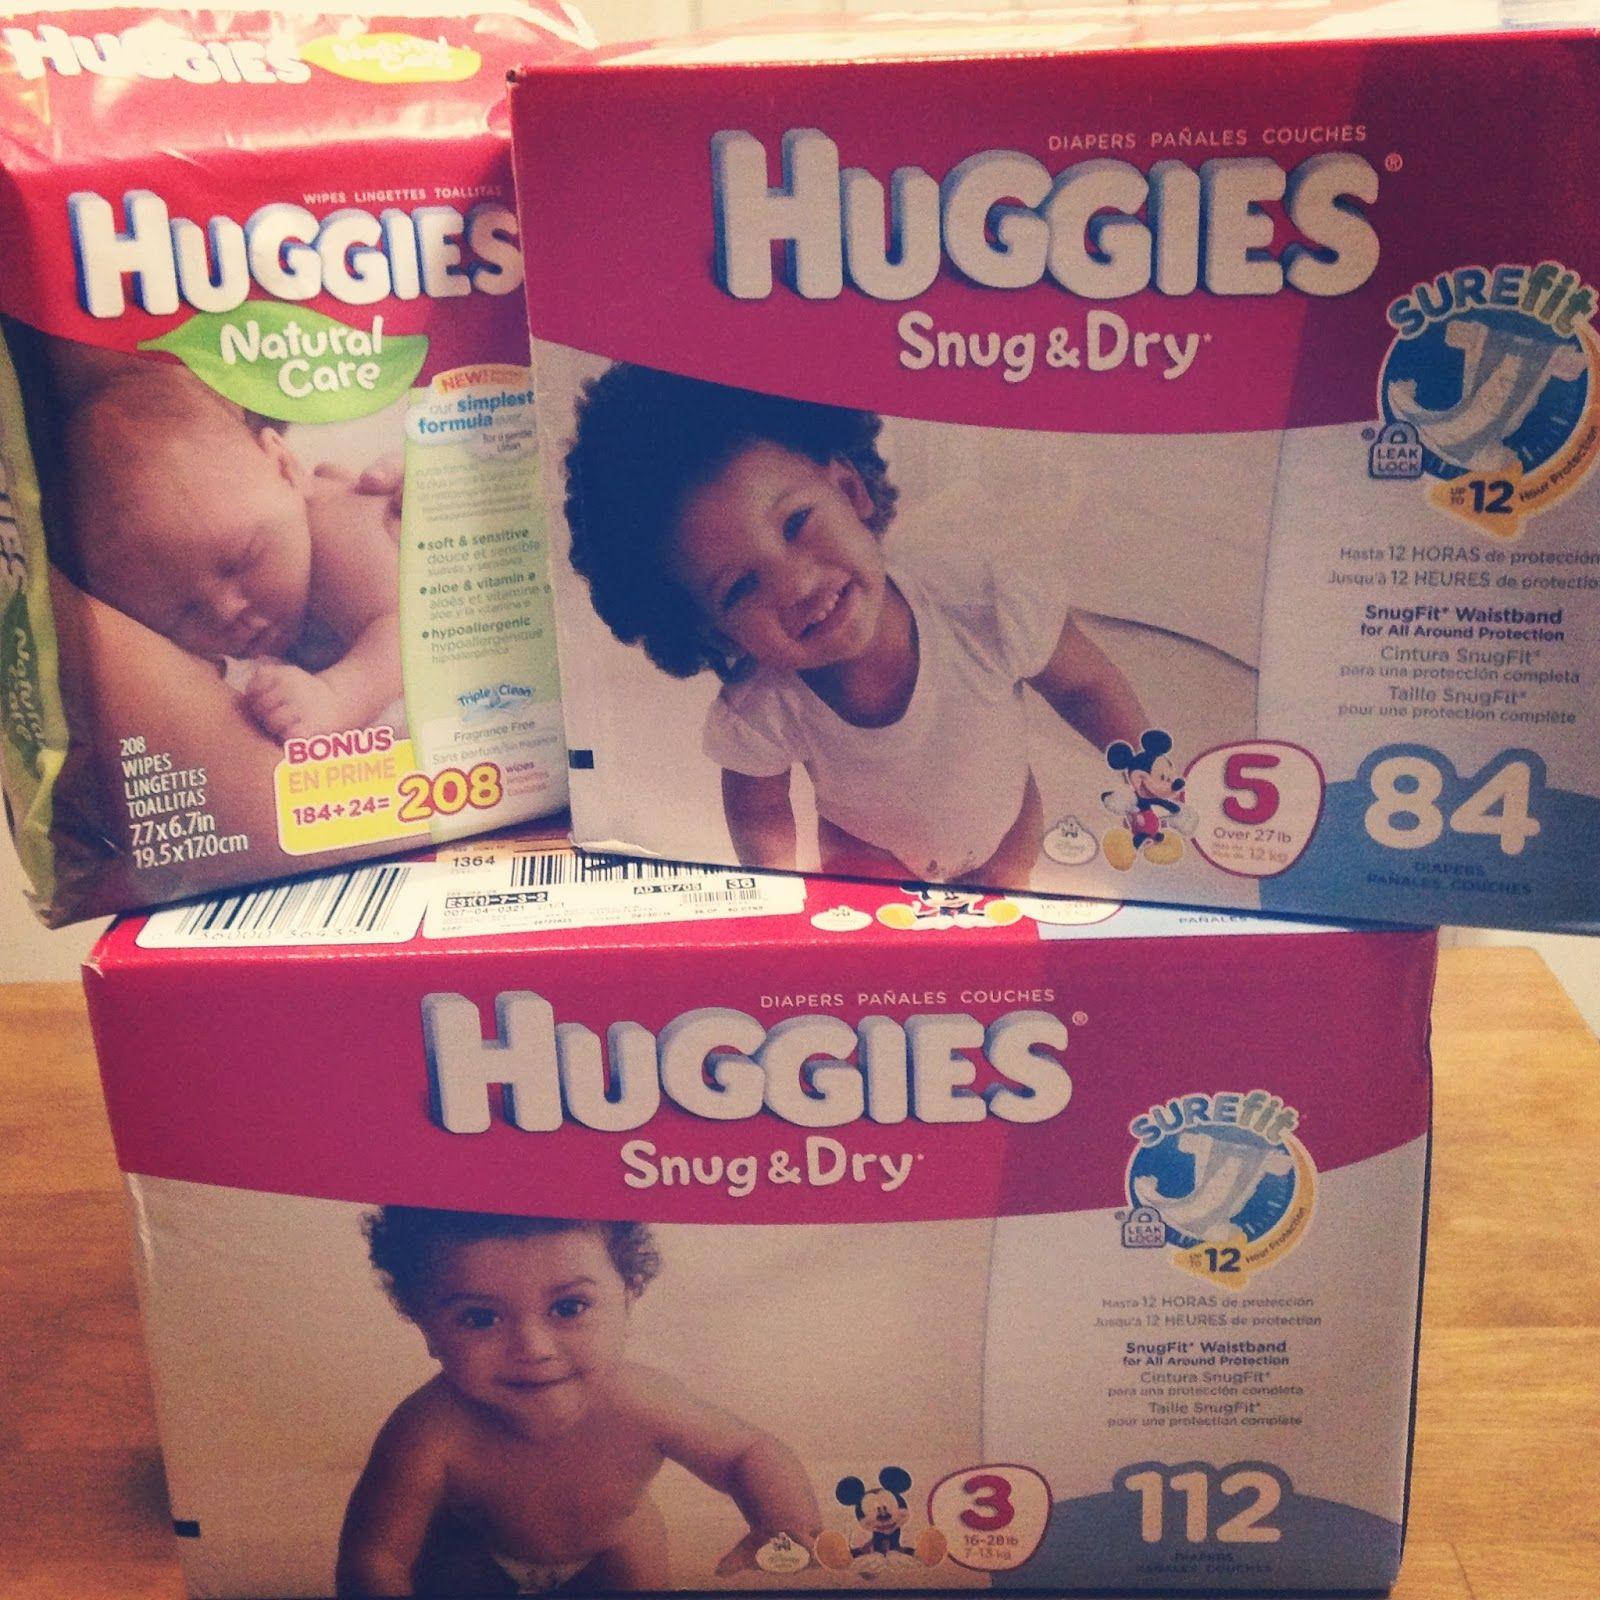 Huggies Diapers & Wipes Review #MC #sponsored